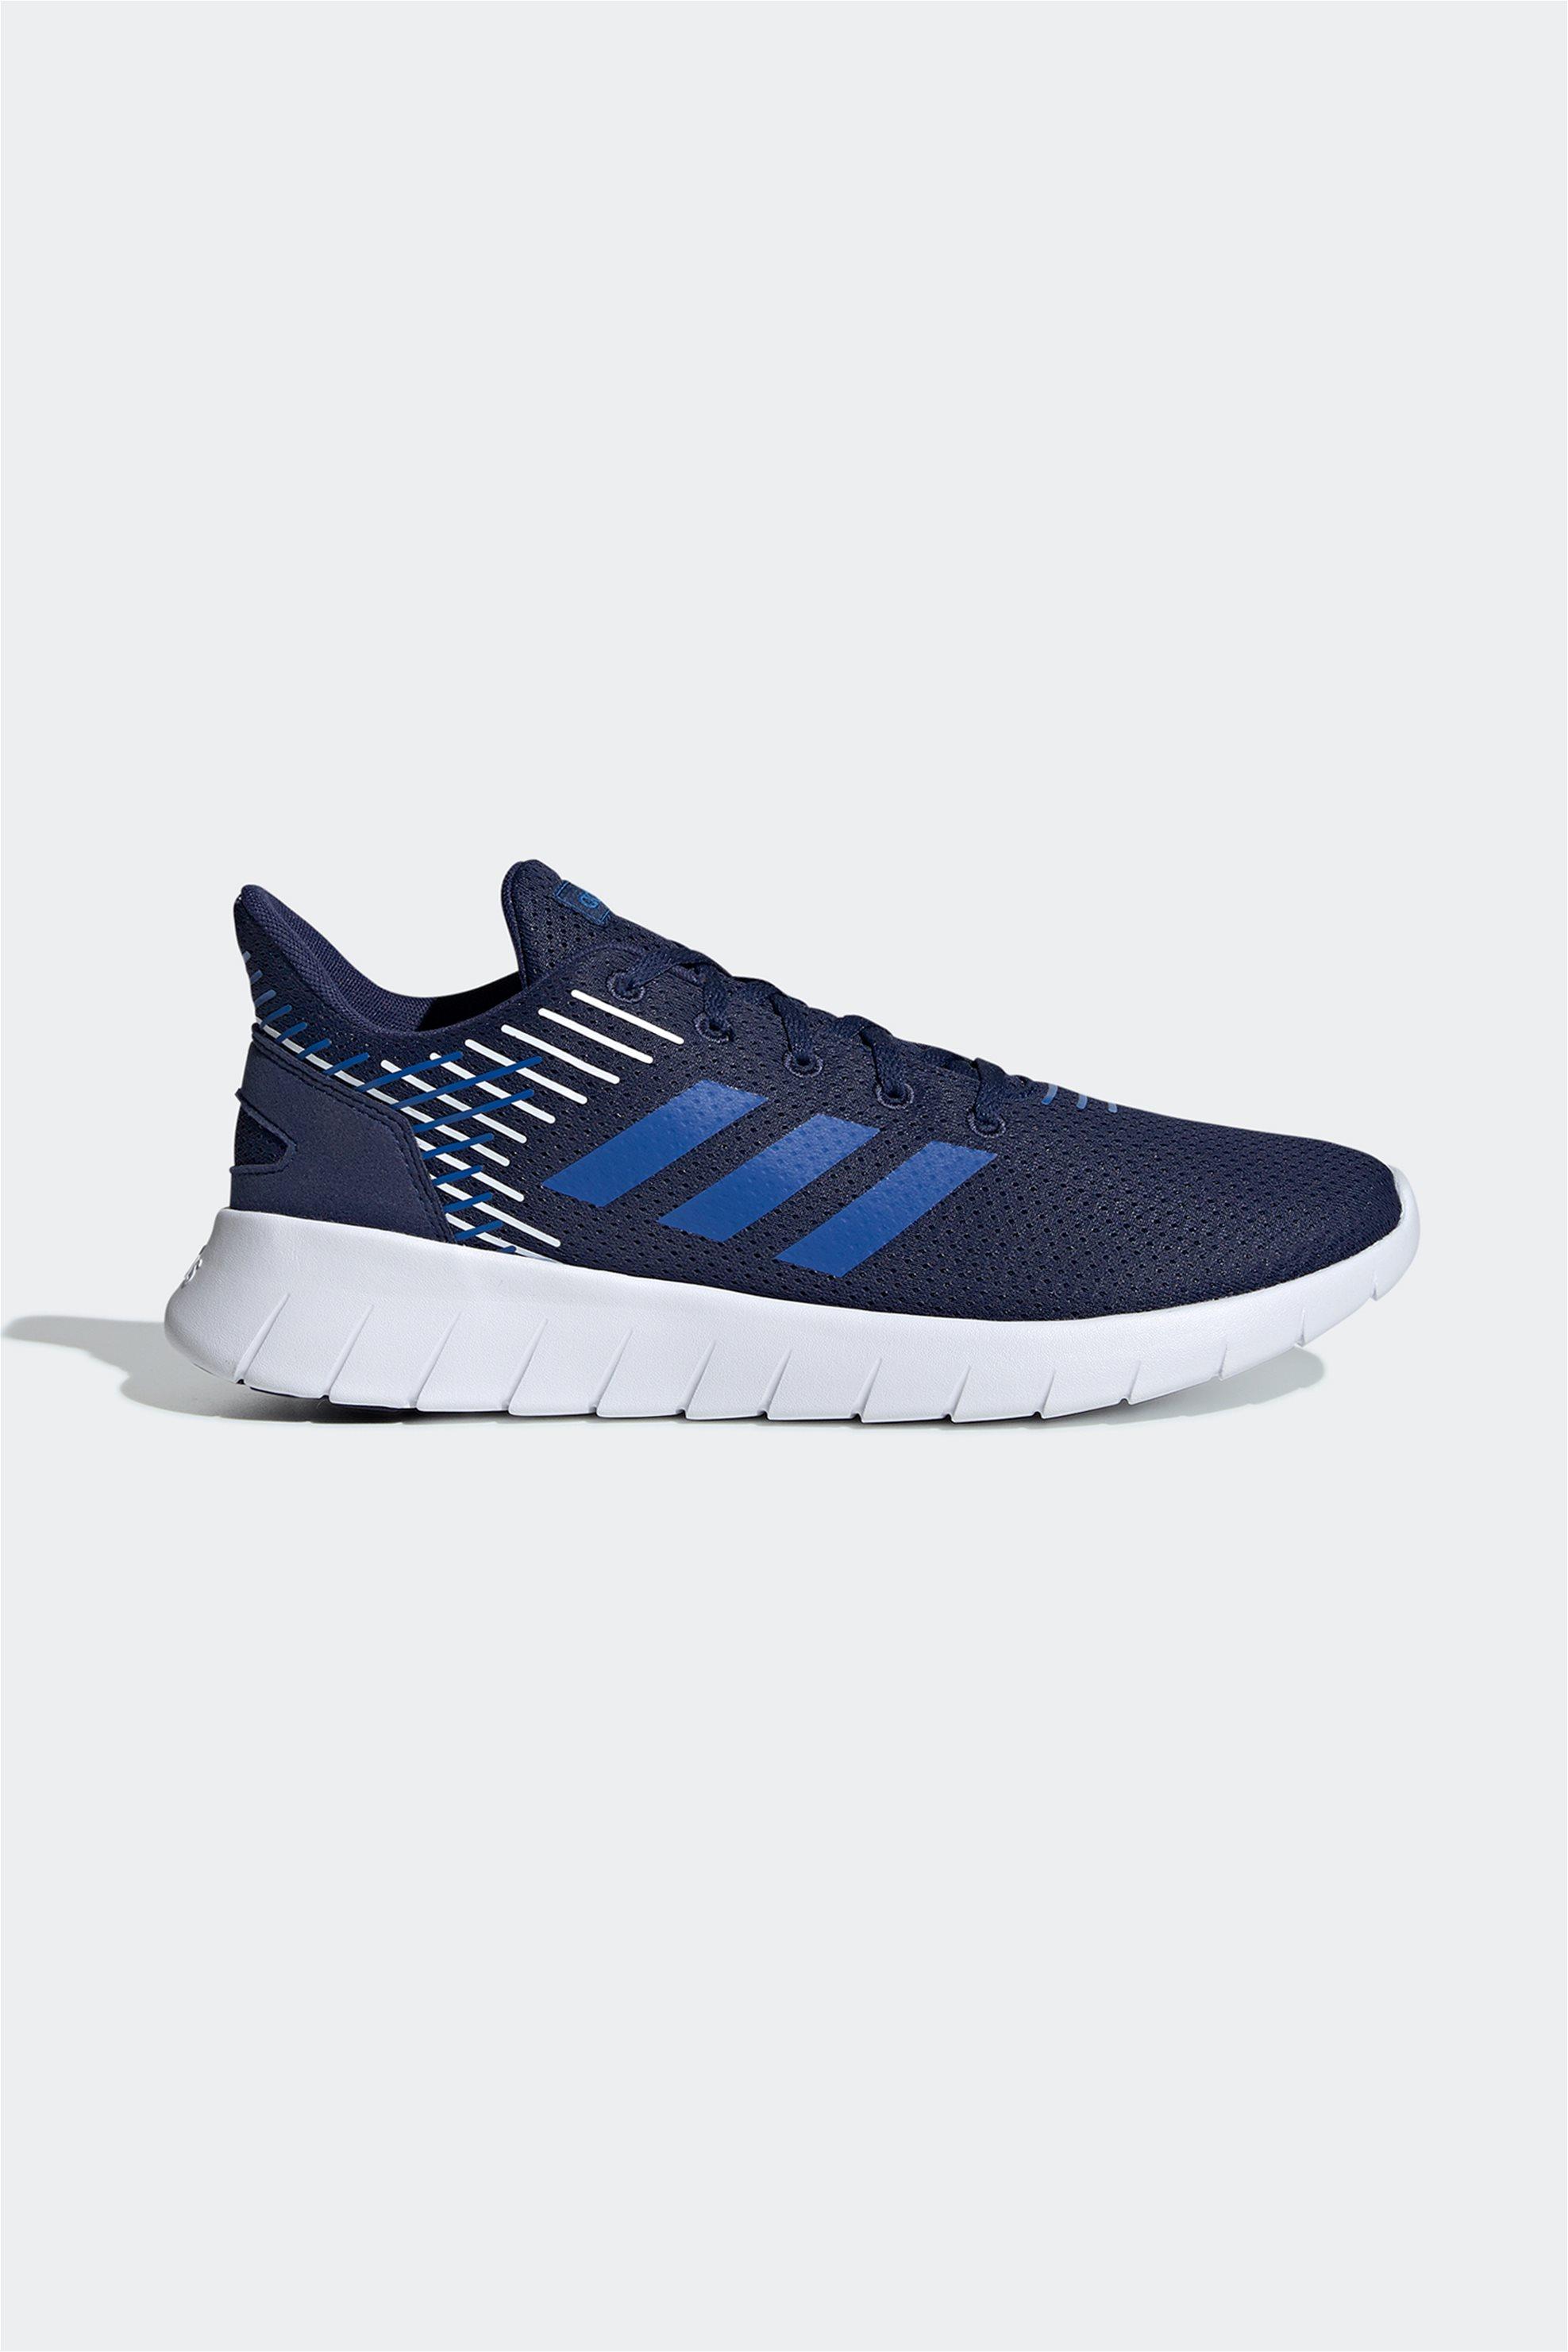 Adidas αθλητικά παπούτσια «Αsweerun» – EE8448 – Μπλε